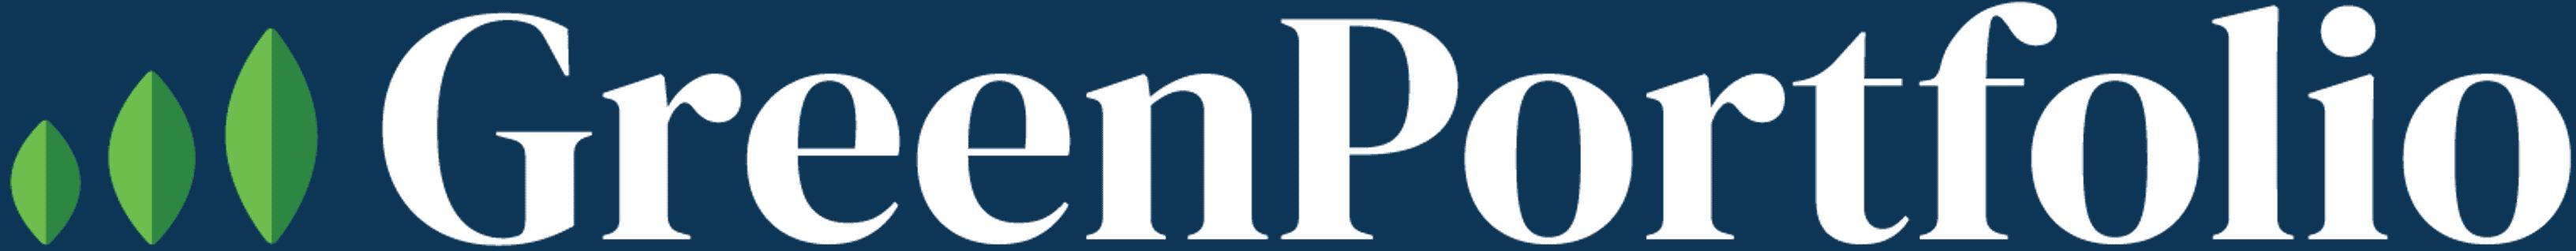 GreenPortfolio_Logo_blue